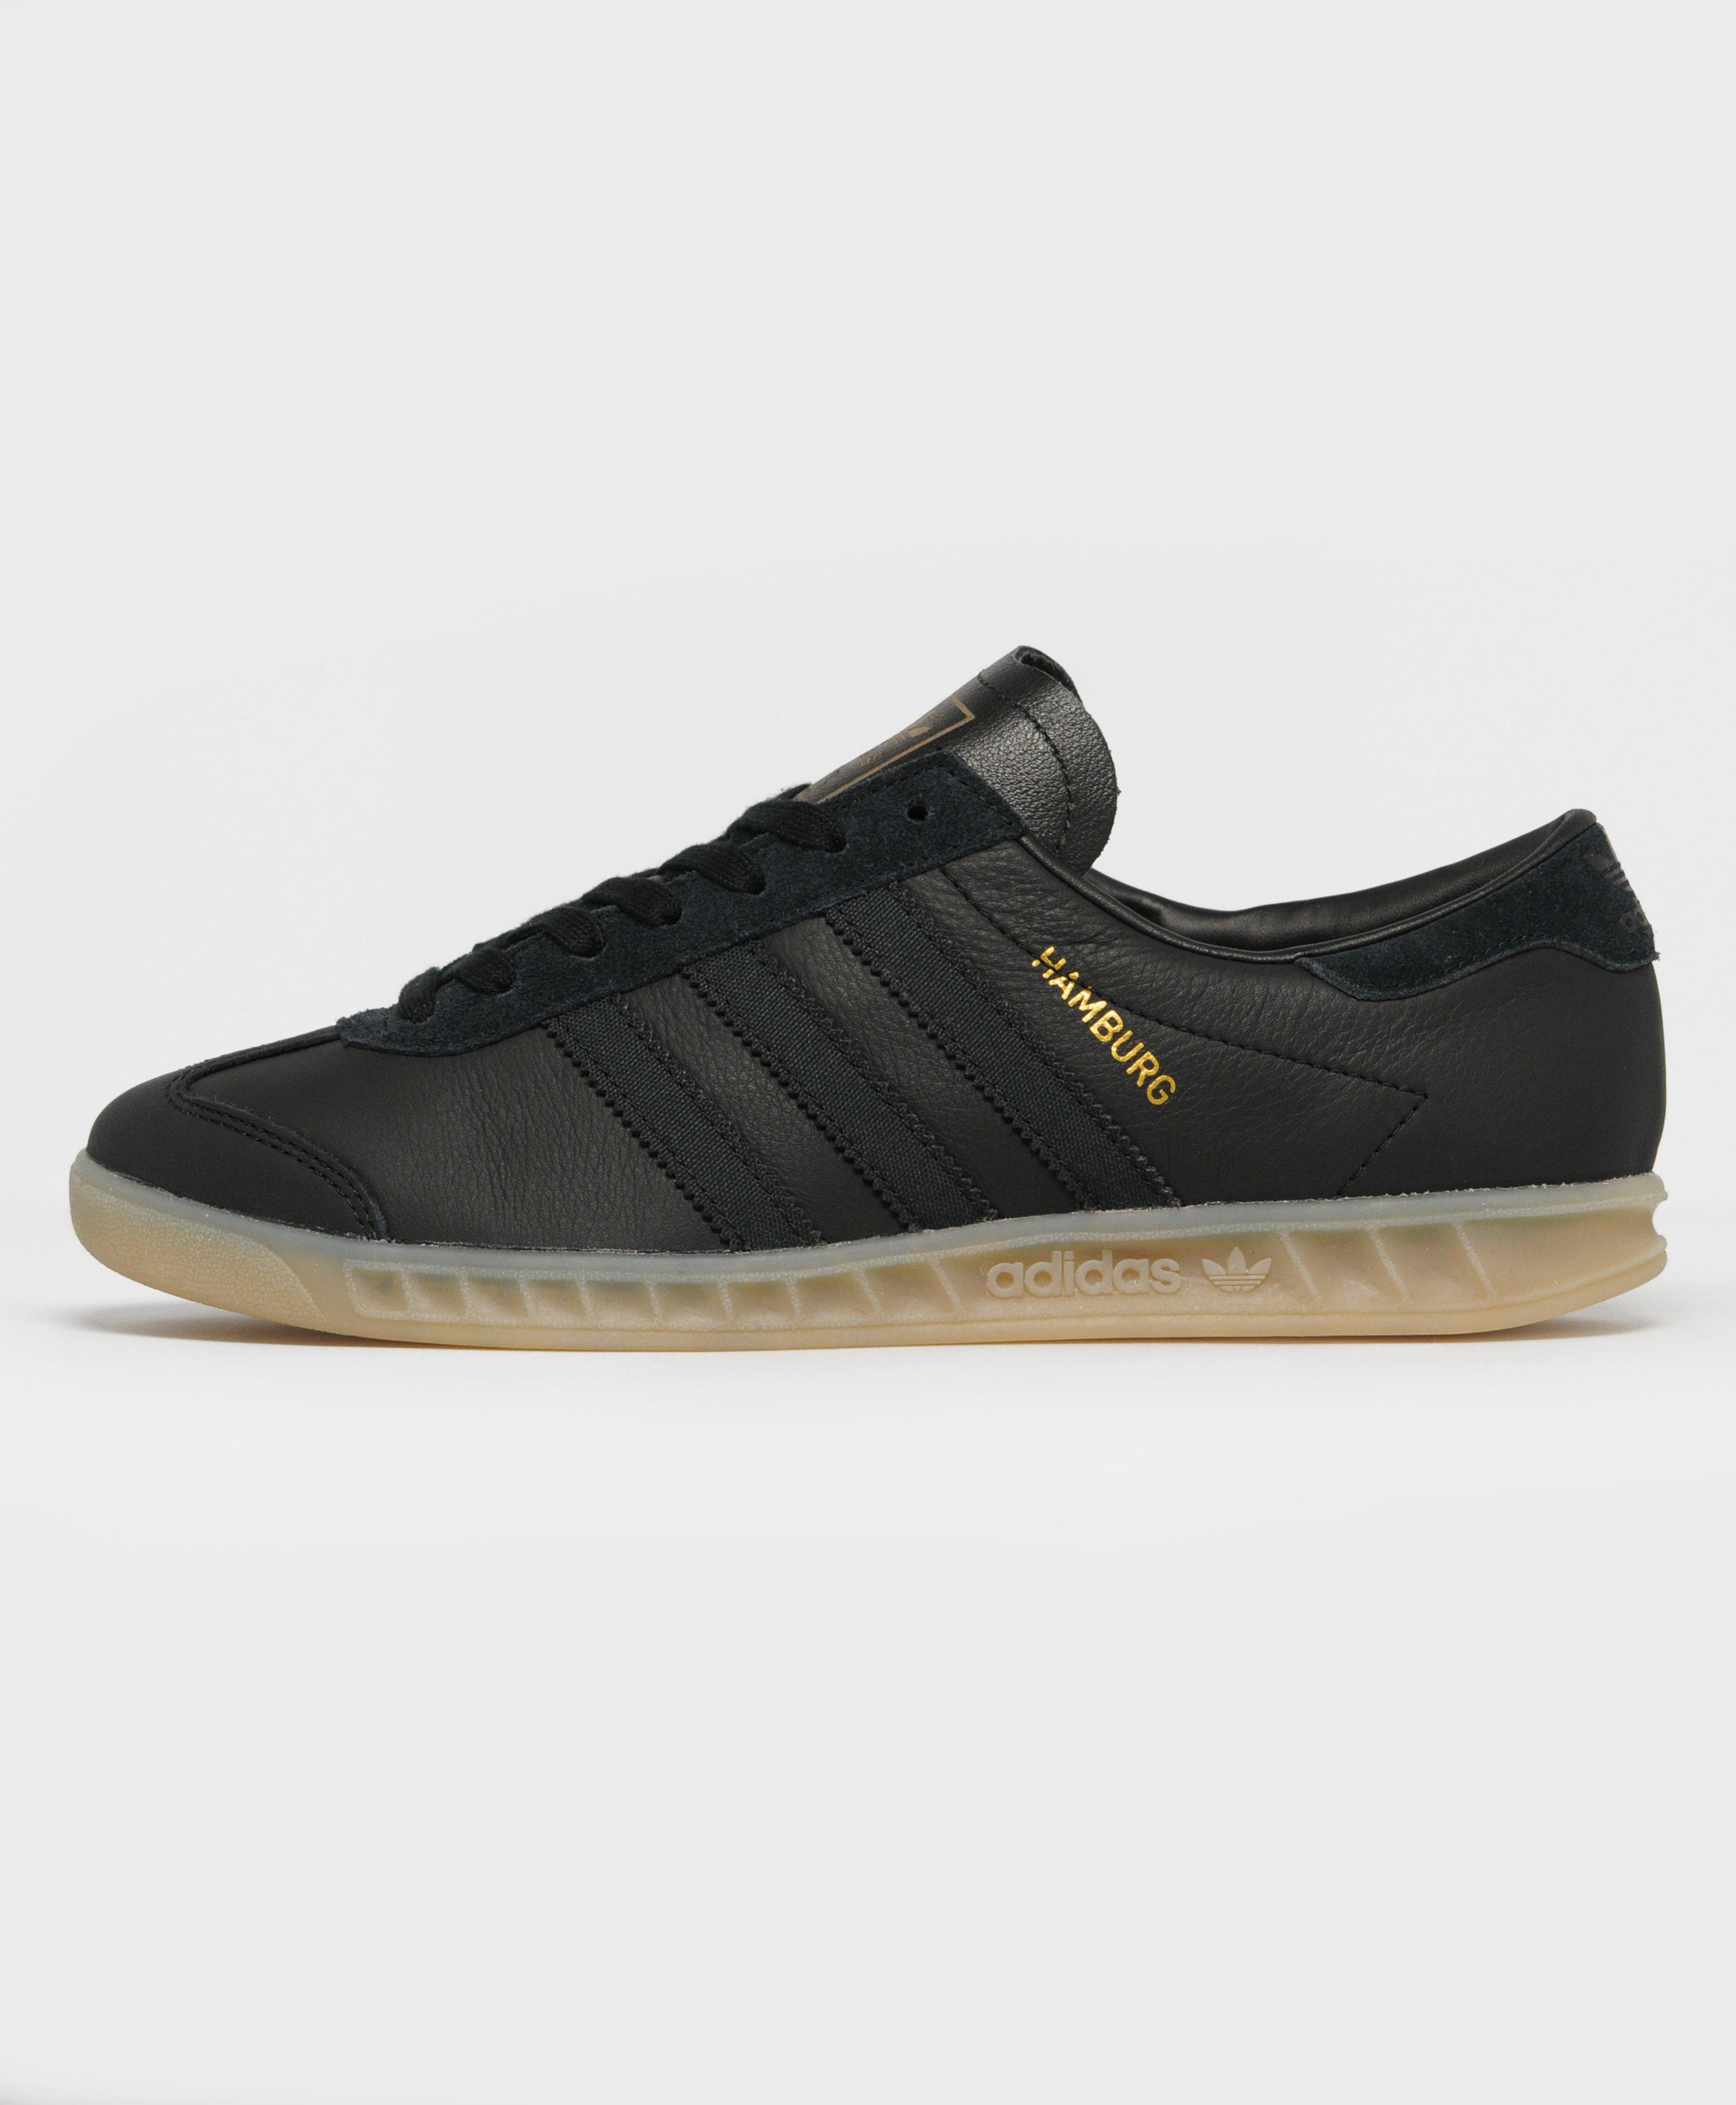 Adidas Gazelle Trainers Sale Uk